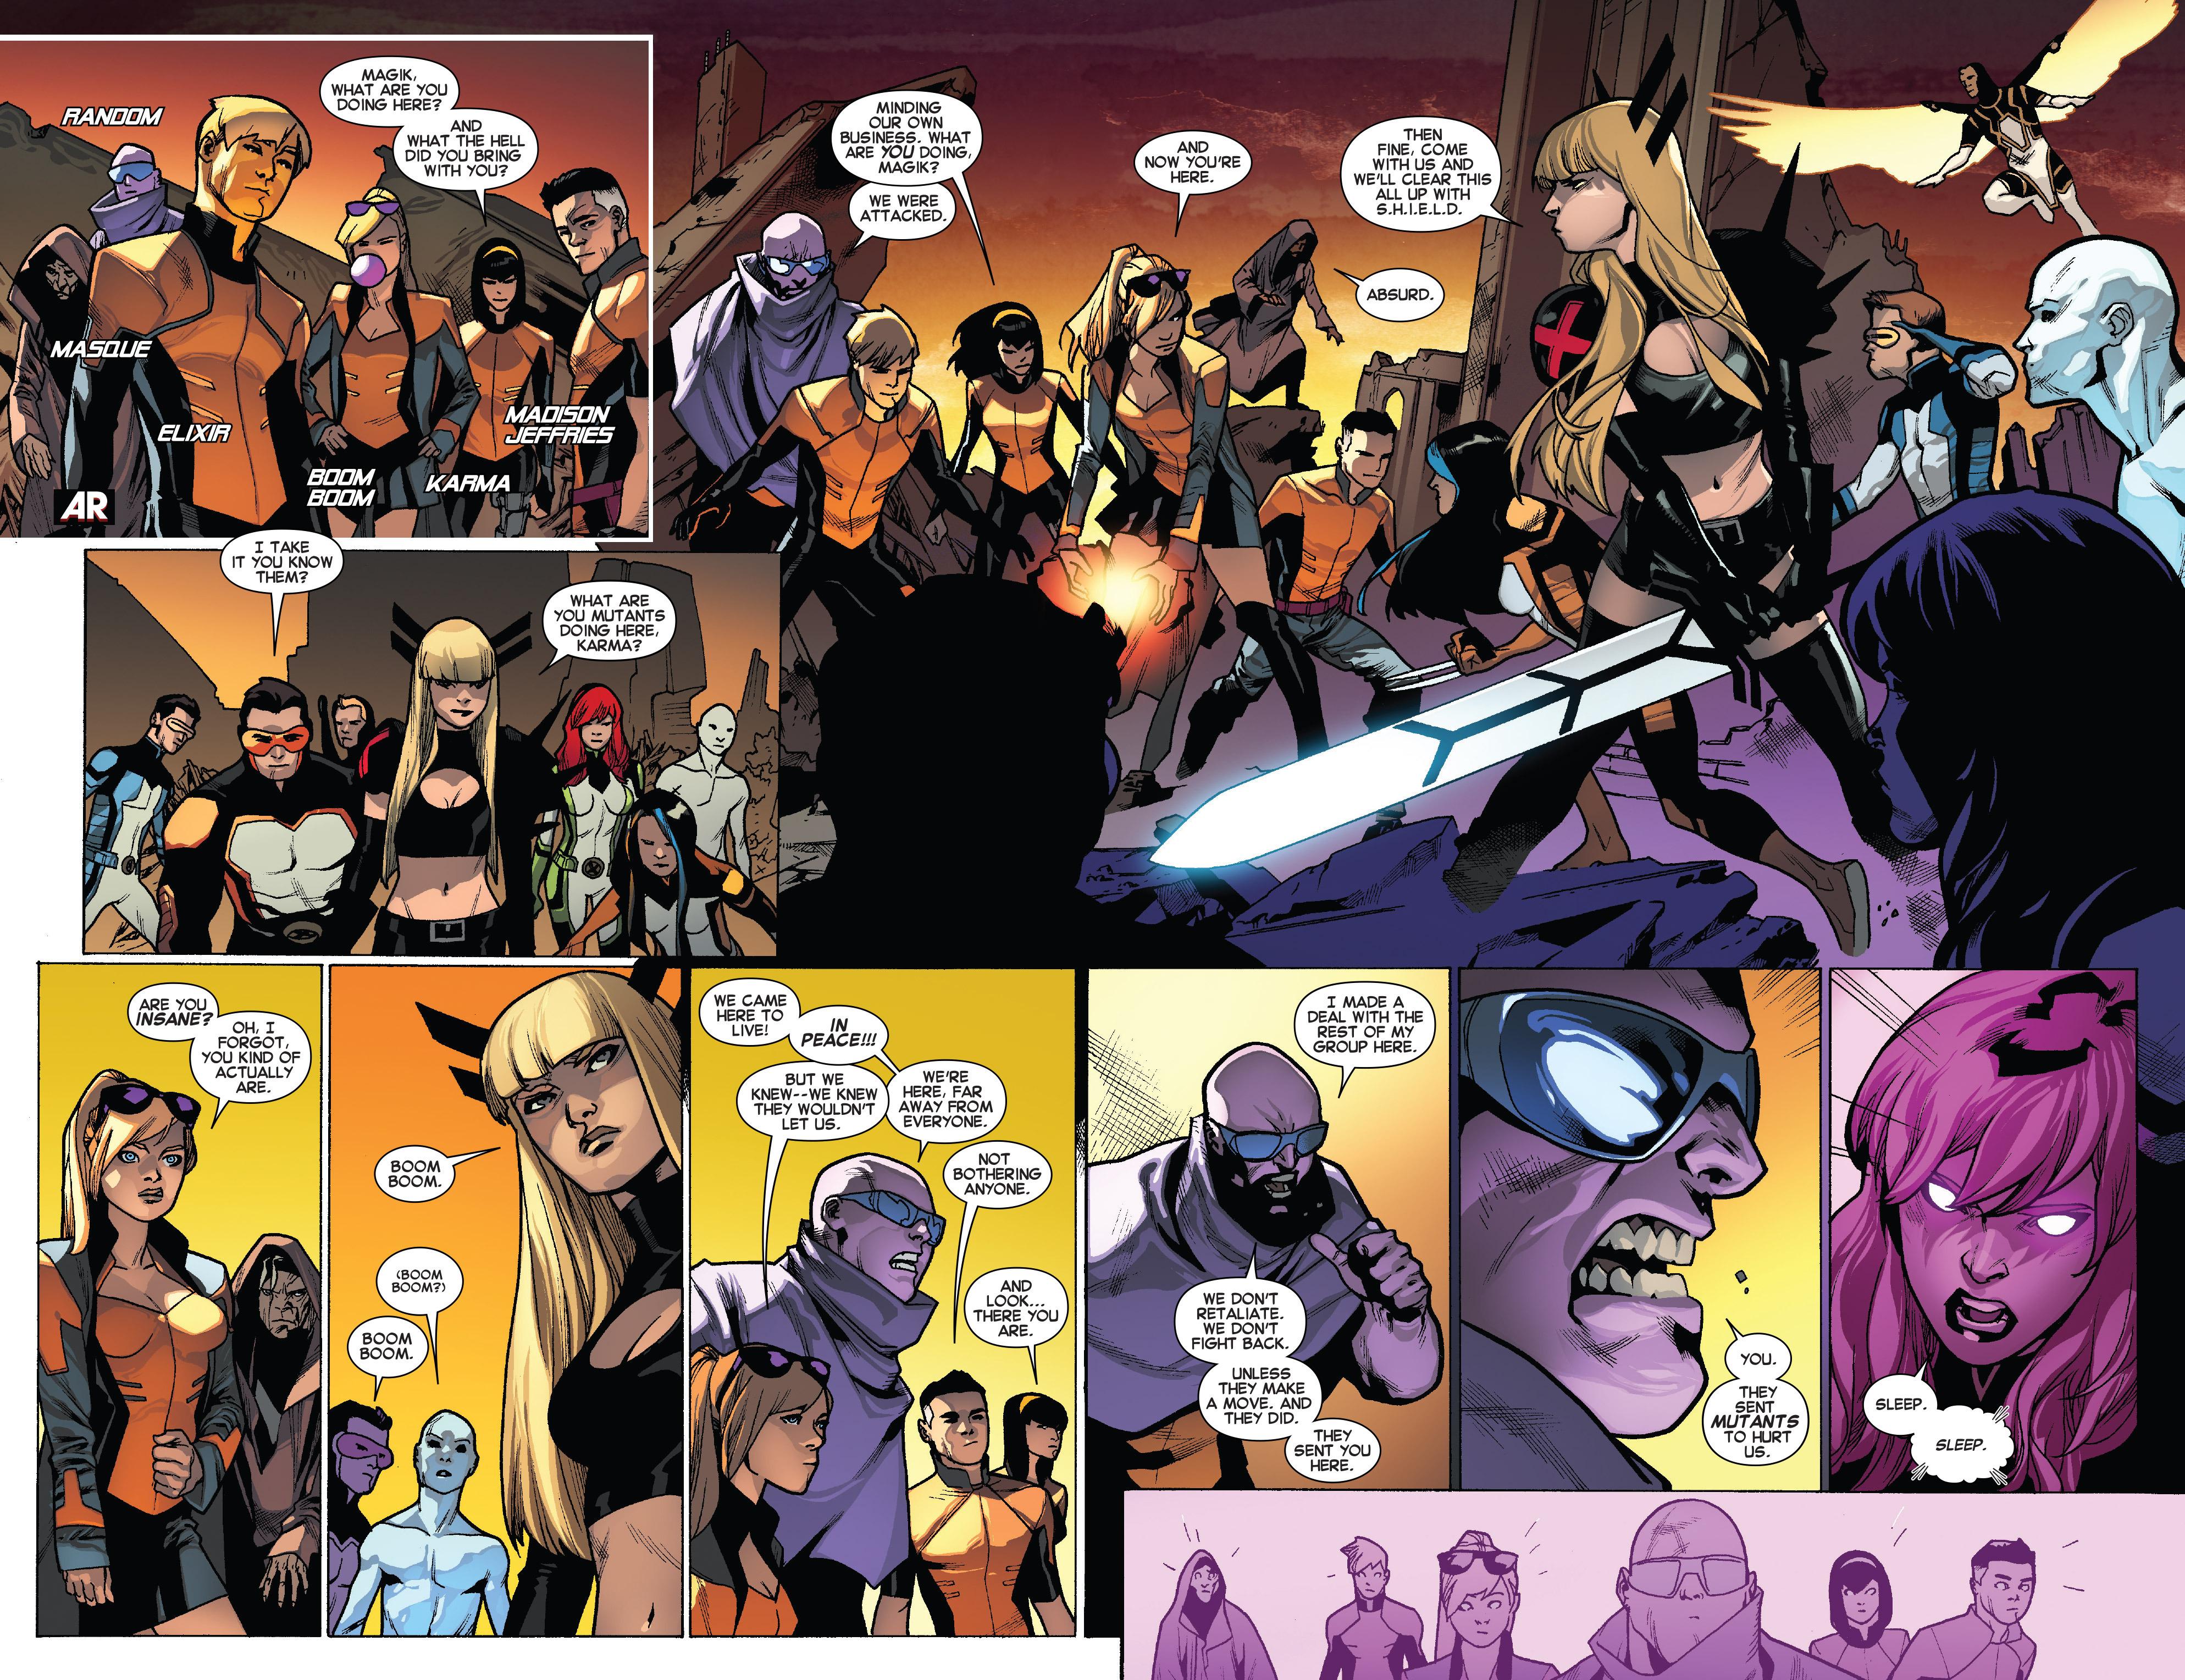 All-New X-Men (2013) chap 41 pic 9